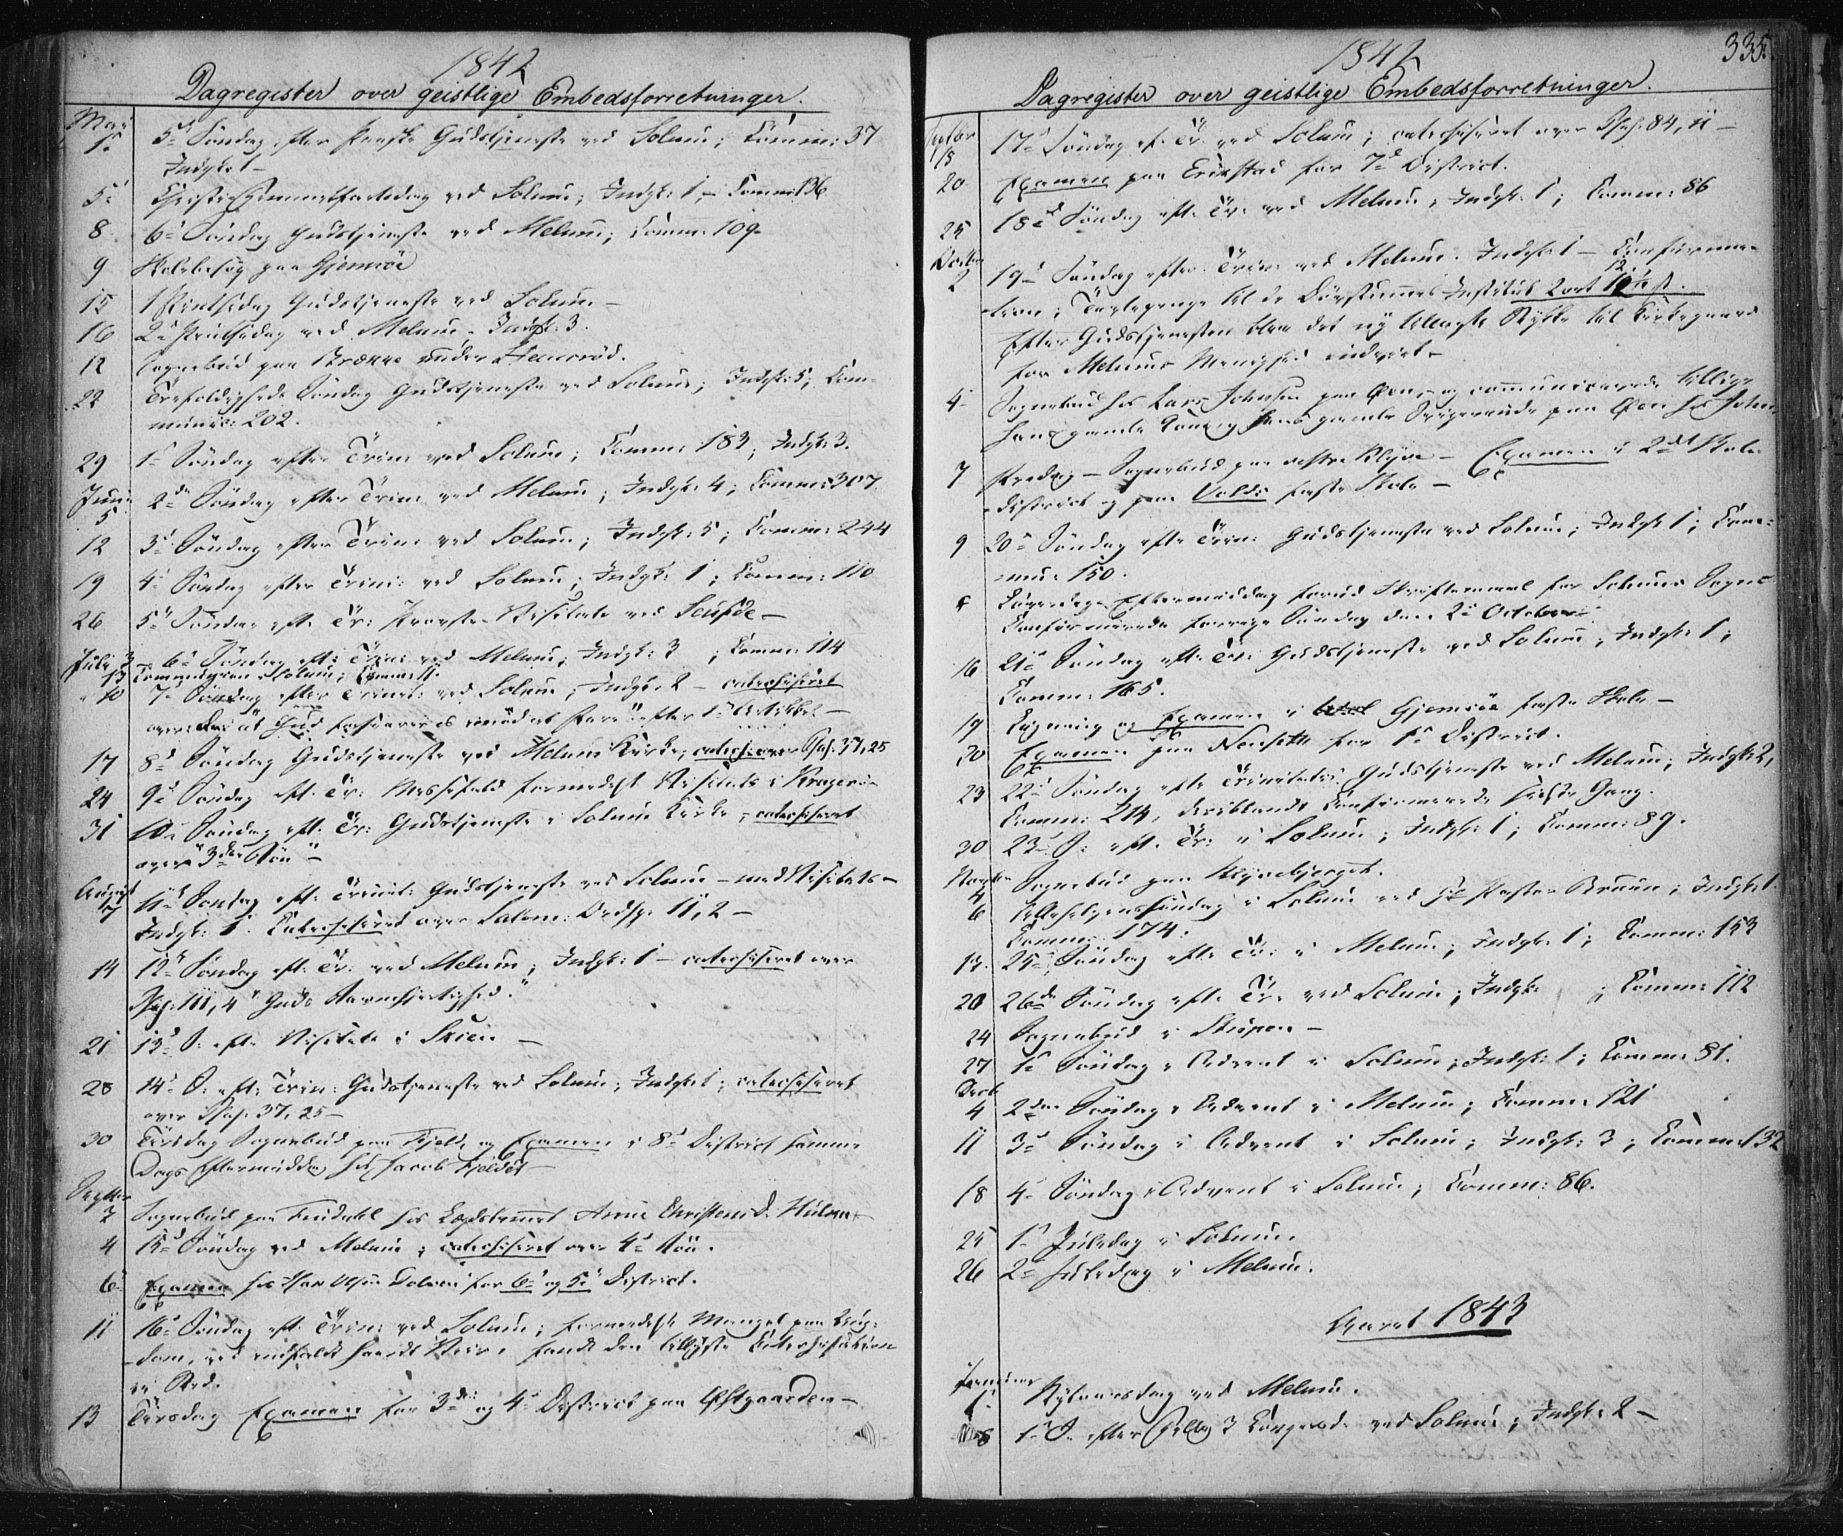 SAKO, Solum kirkebøker, F/Fa/L0005: Ministerialbok nr. I 5, 1833-1843, s. 335